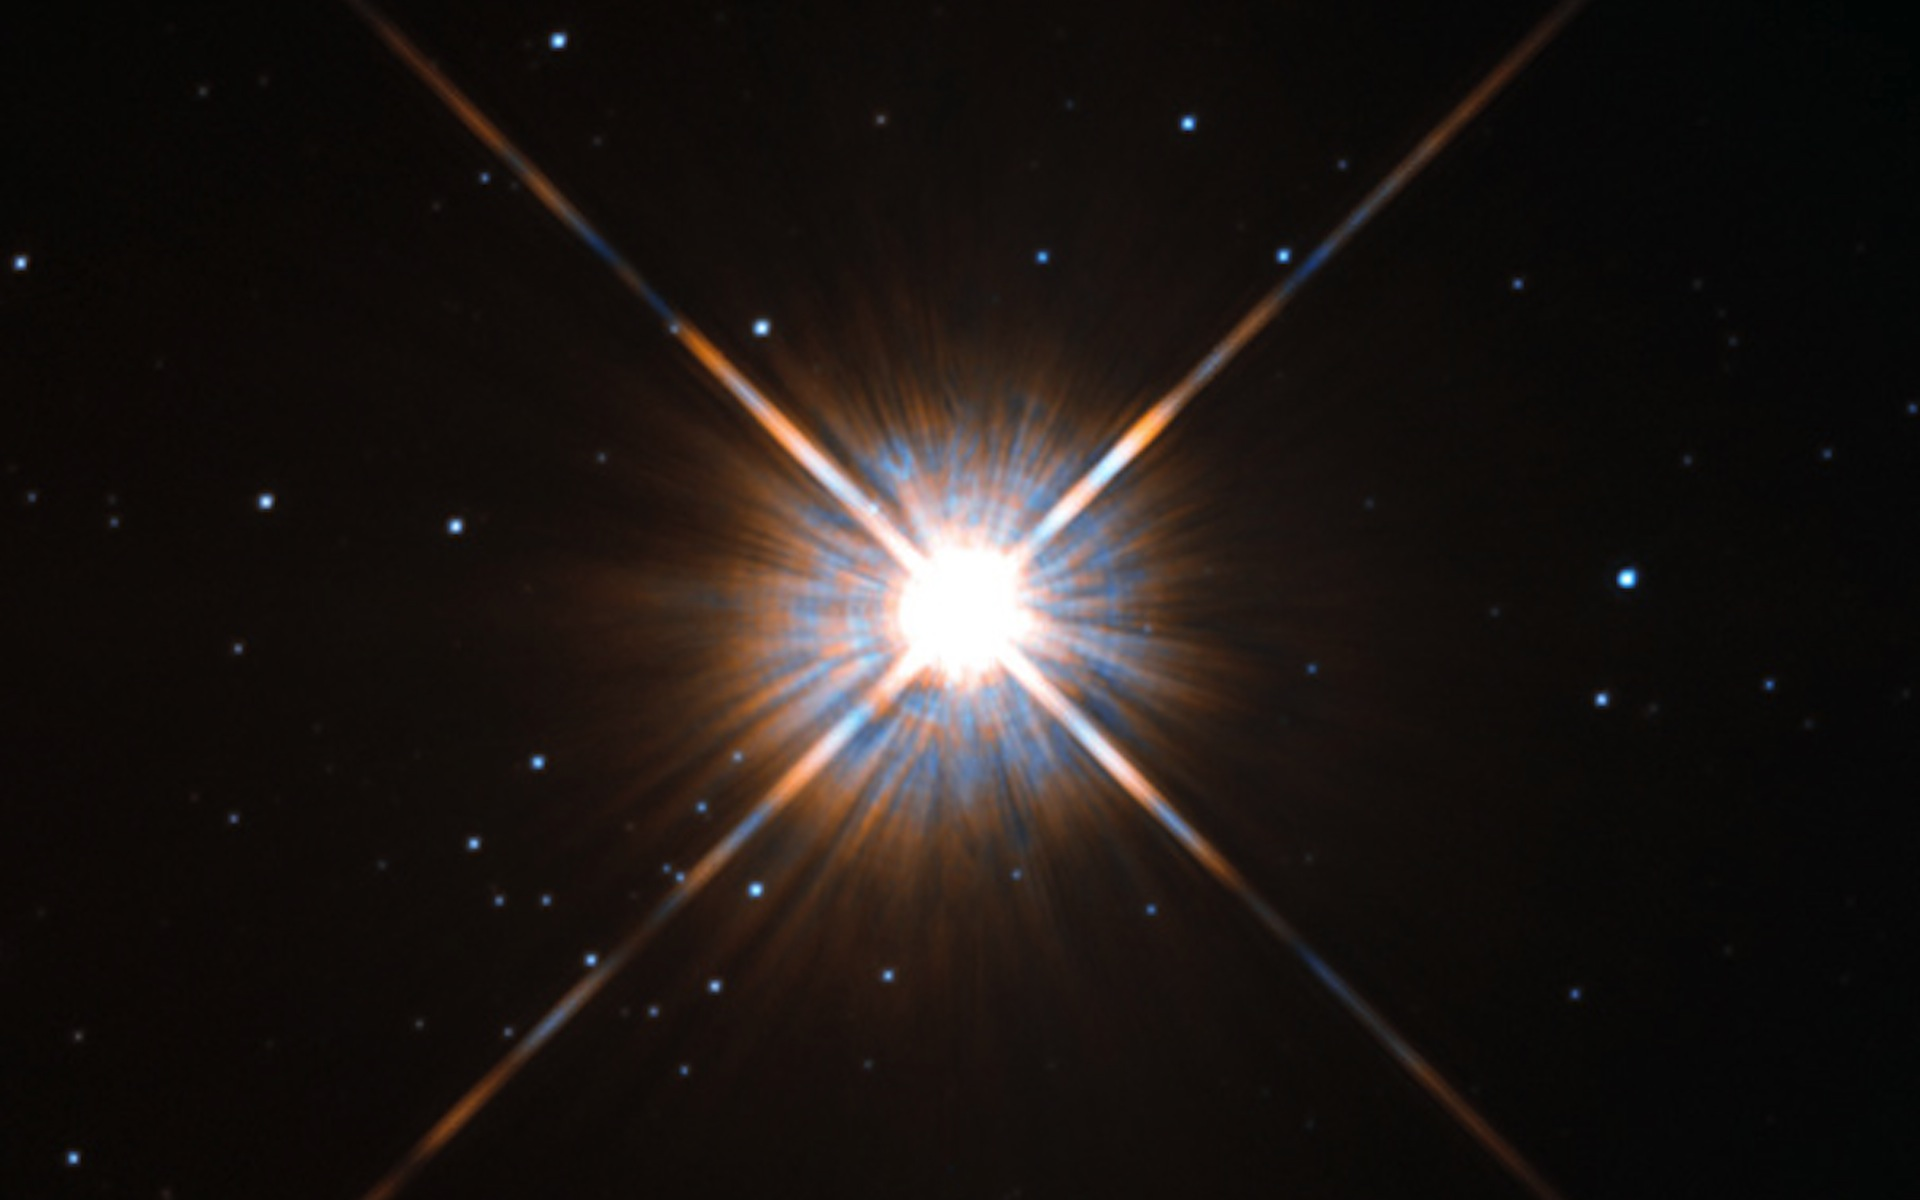 Proxima Centauri, Nearest Star to Sun, Seen by Hubble Telescope (Photo)